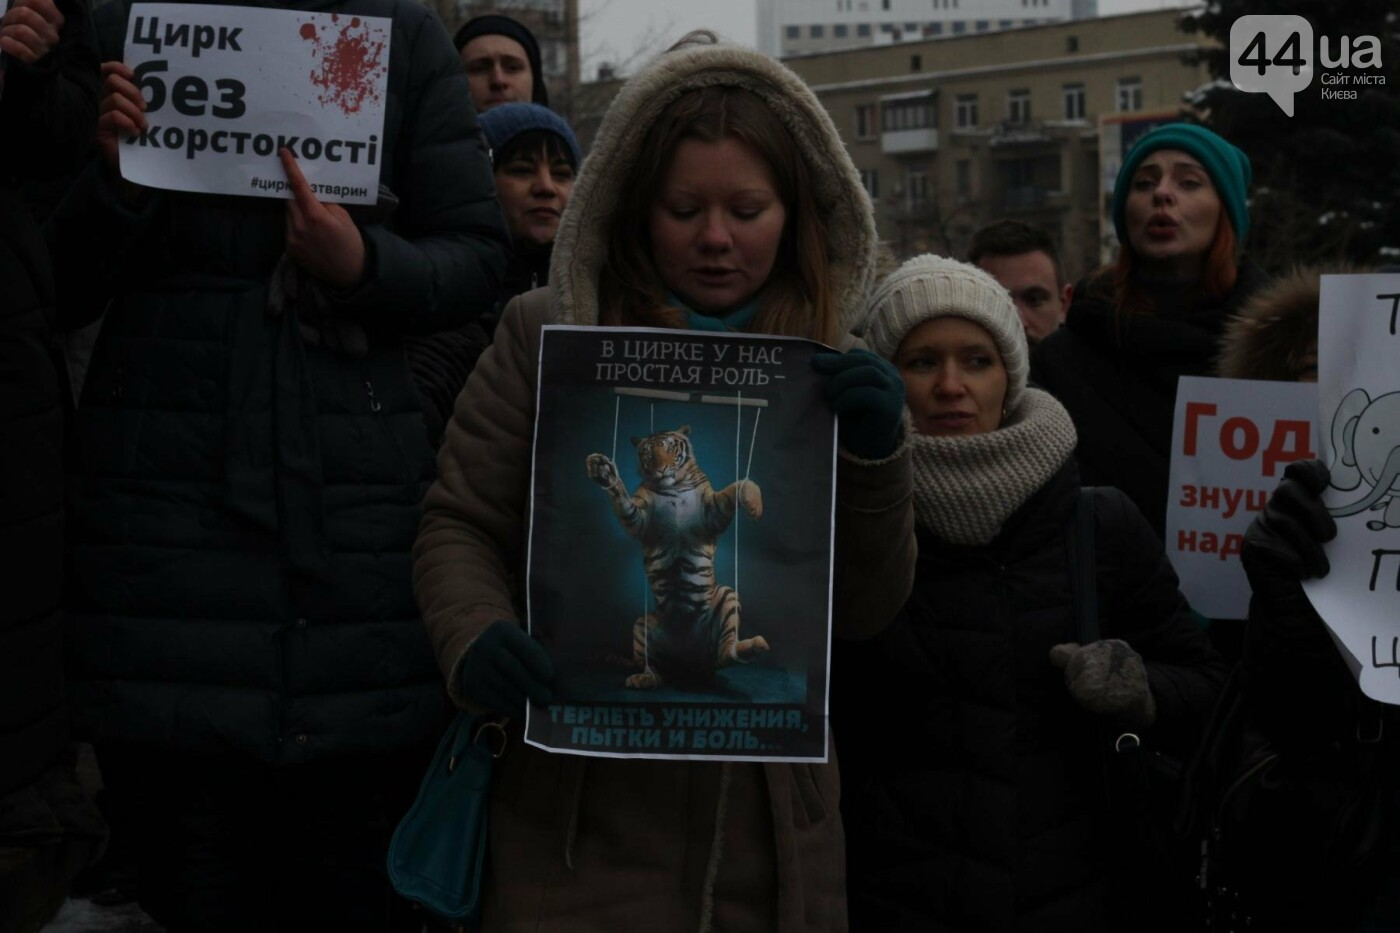 Цирк без животных: как в Киеве прошла акция протеста, фото-5